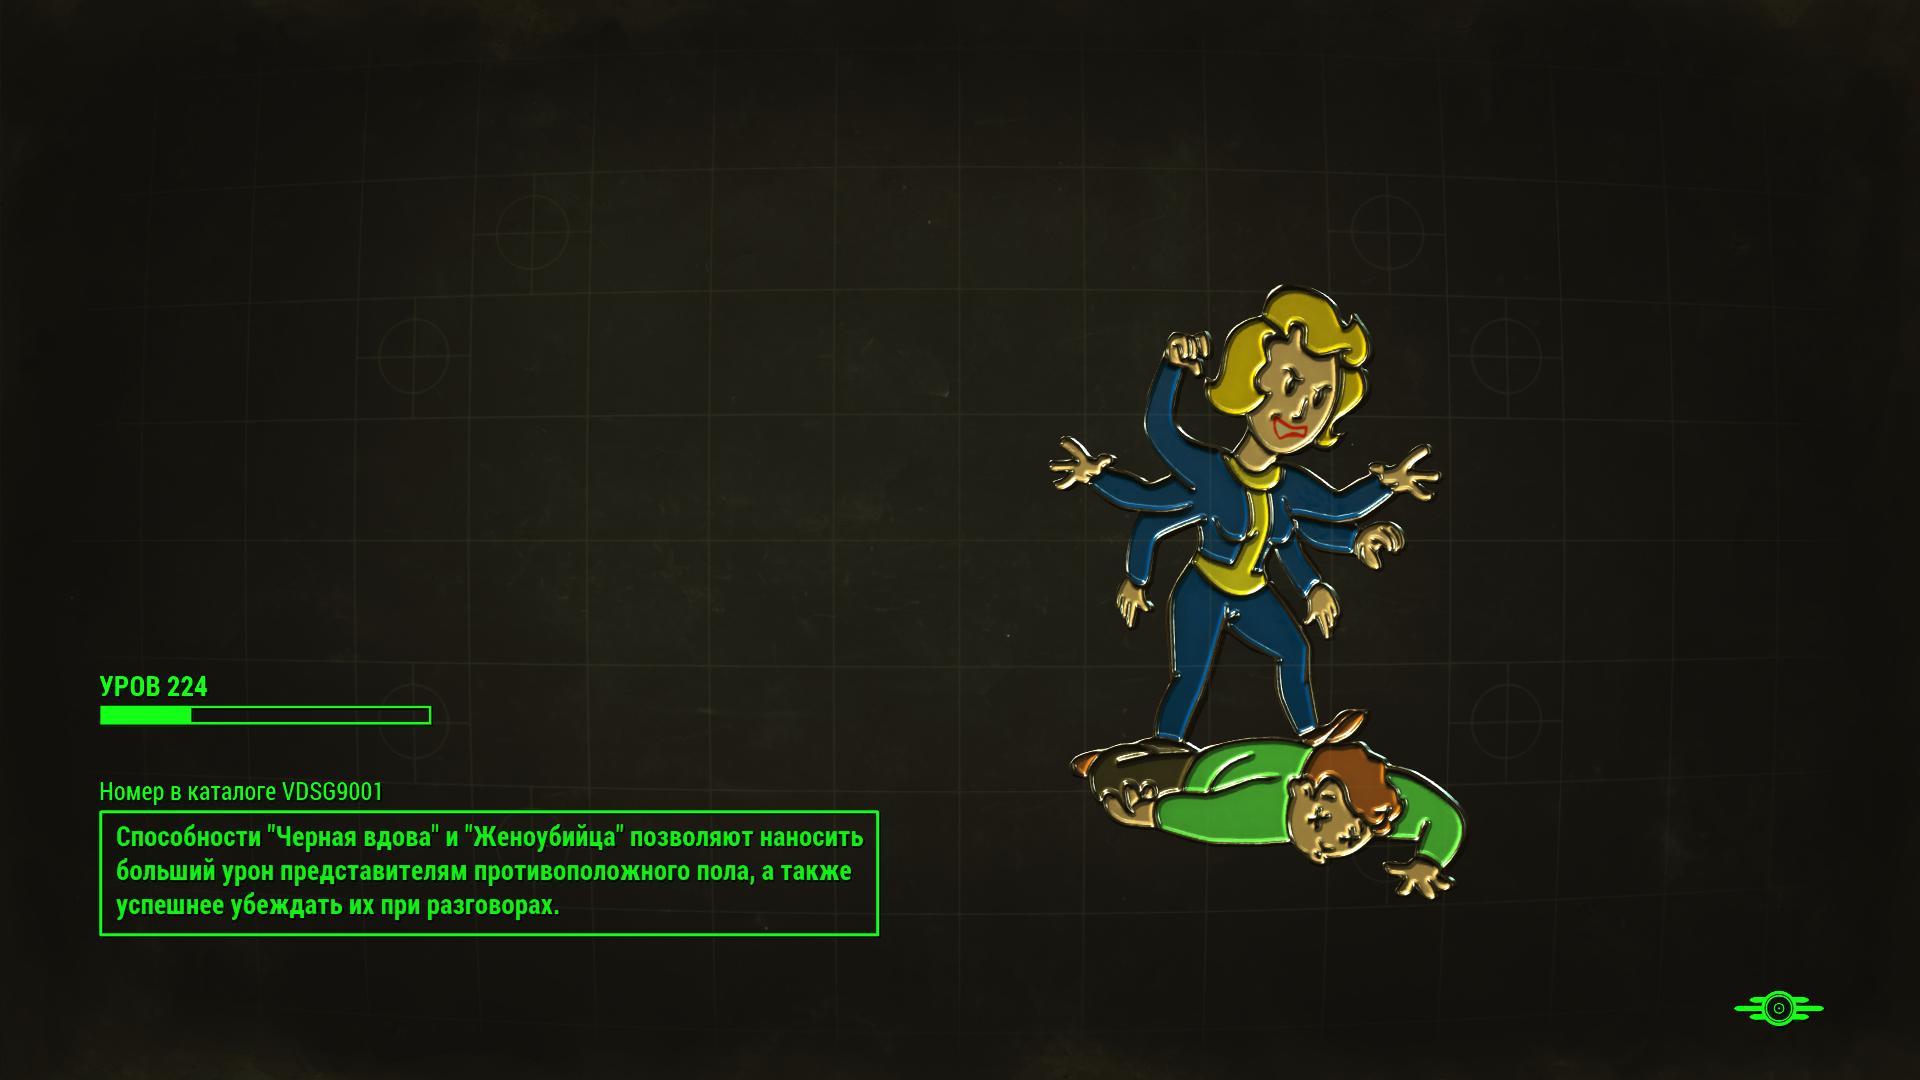 Женоубийца (Fallout 4)